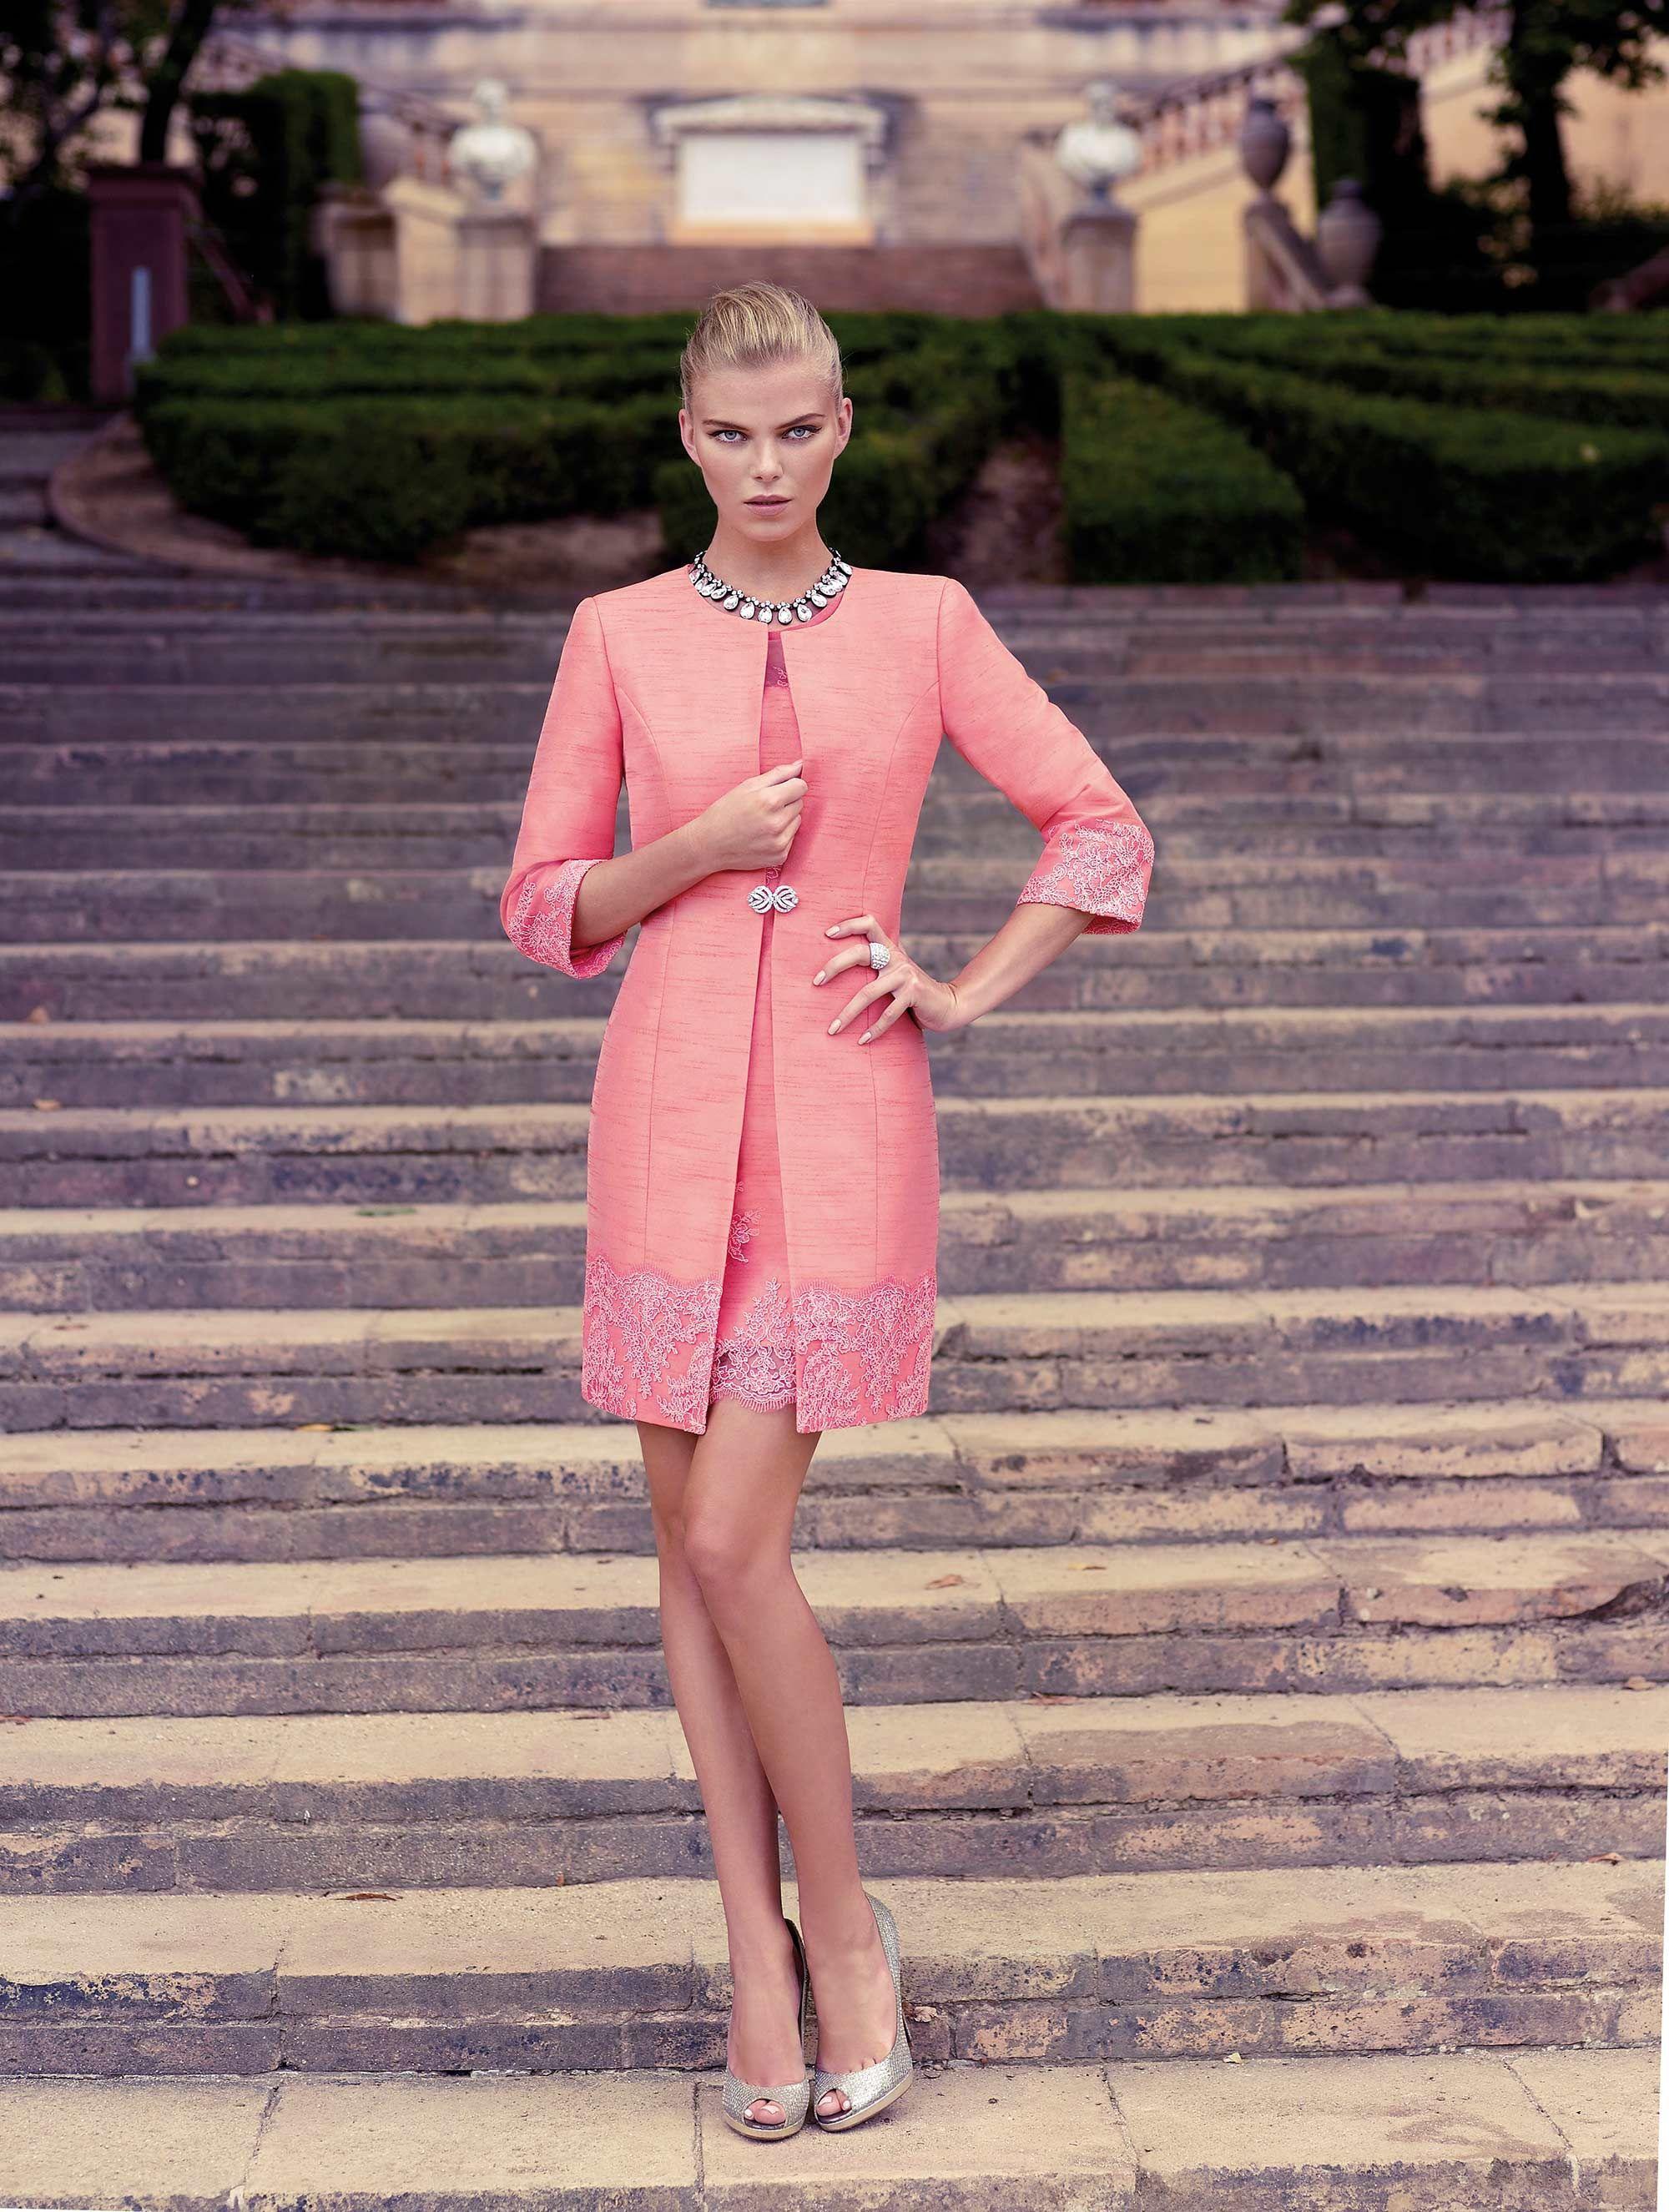 Pin de Florence Nightingale F. Arango M. en Moda Especial | Pinterest